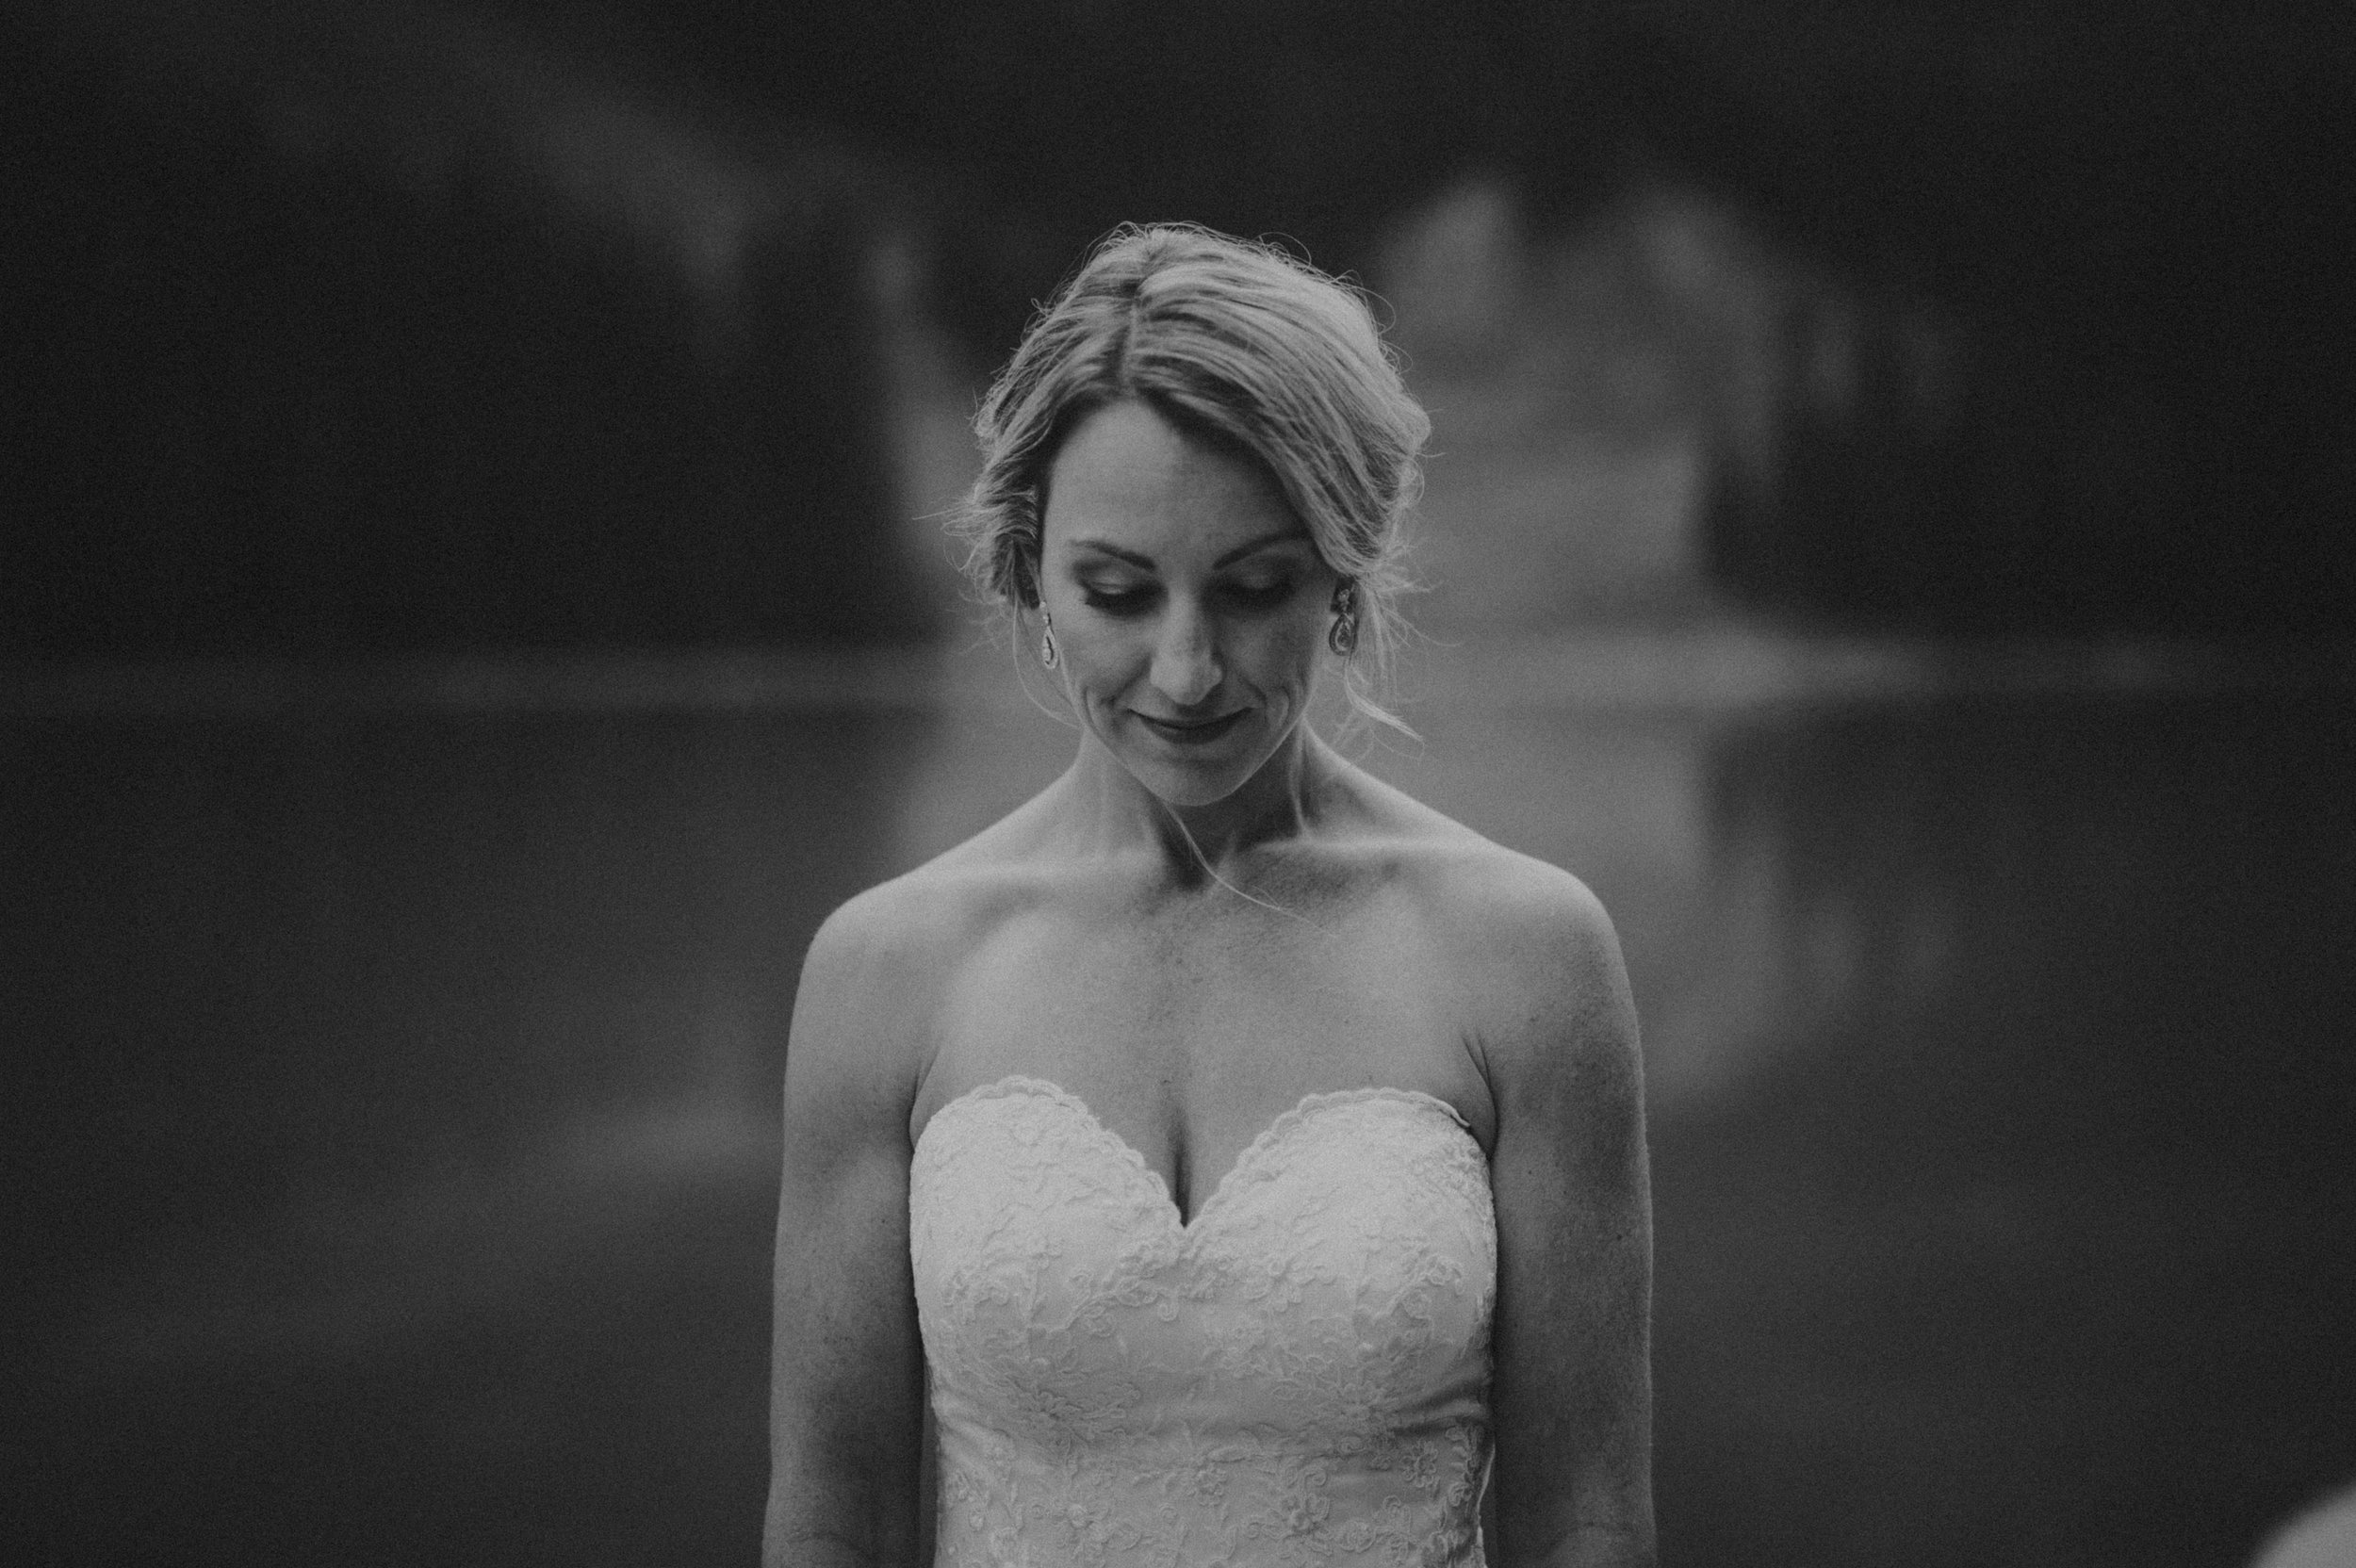 Banff-Wedding-Photographer-16.jpg